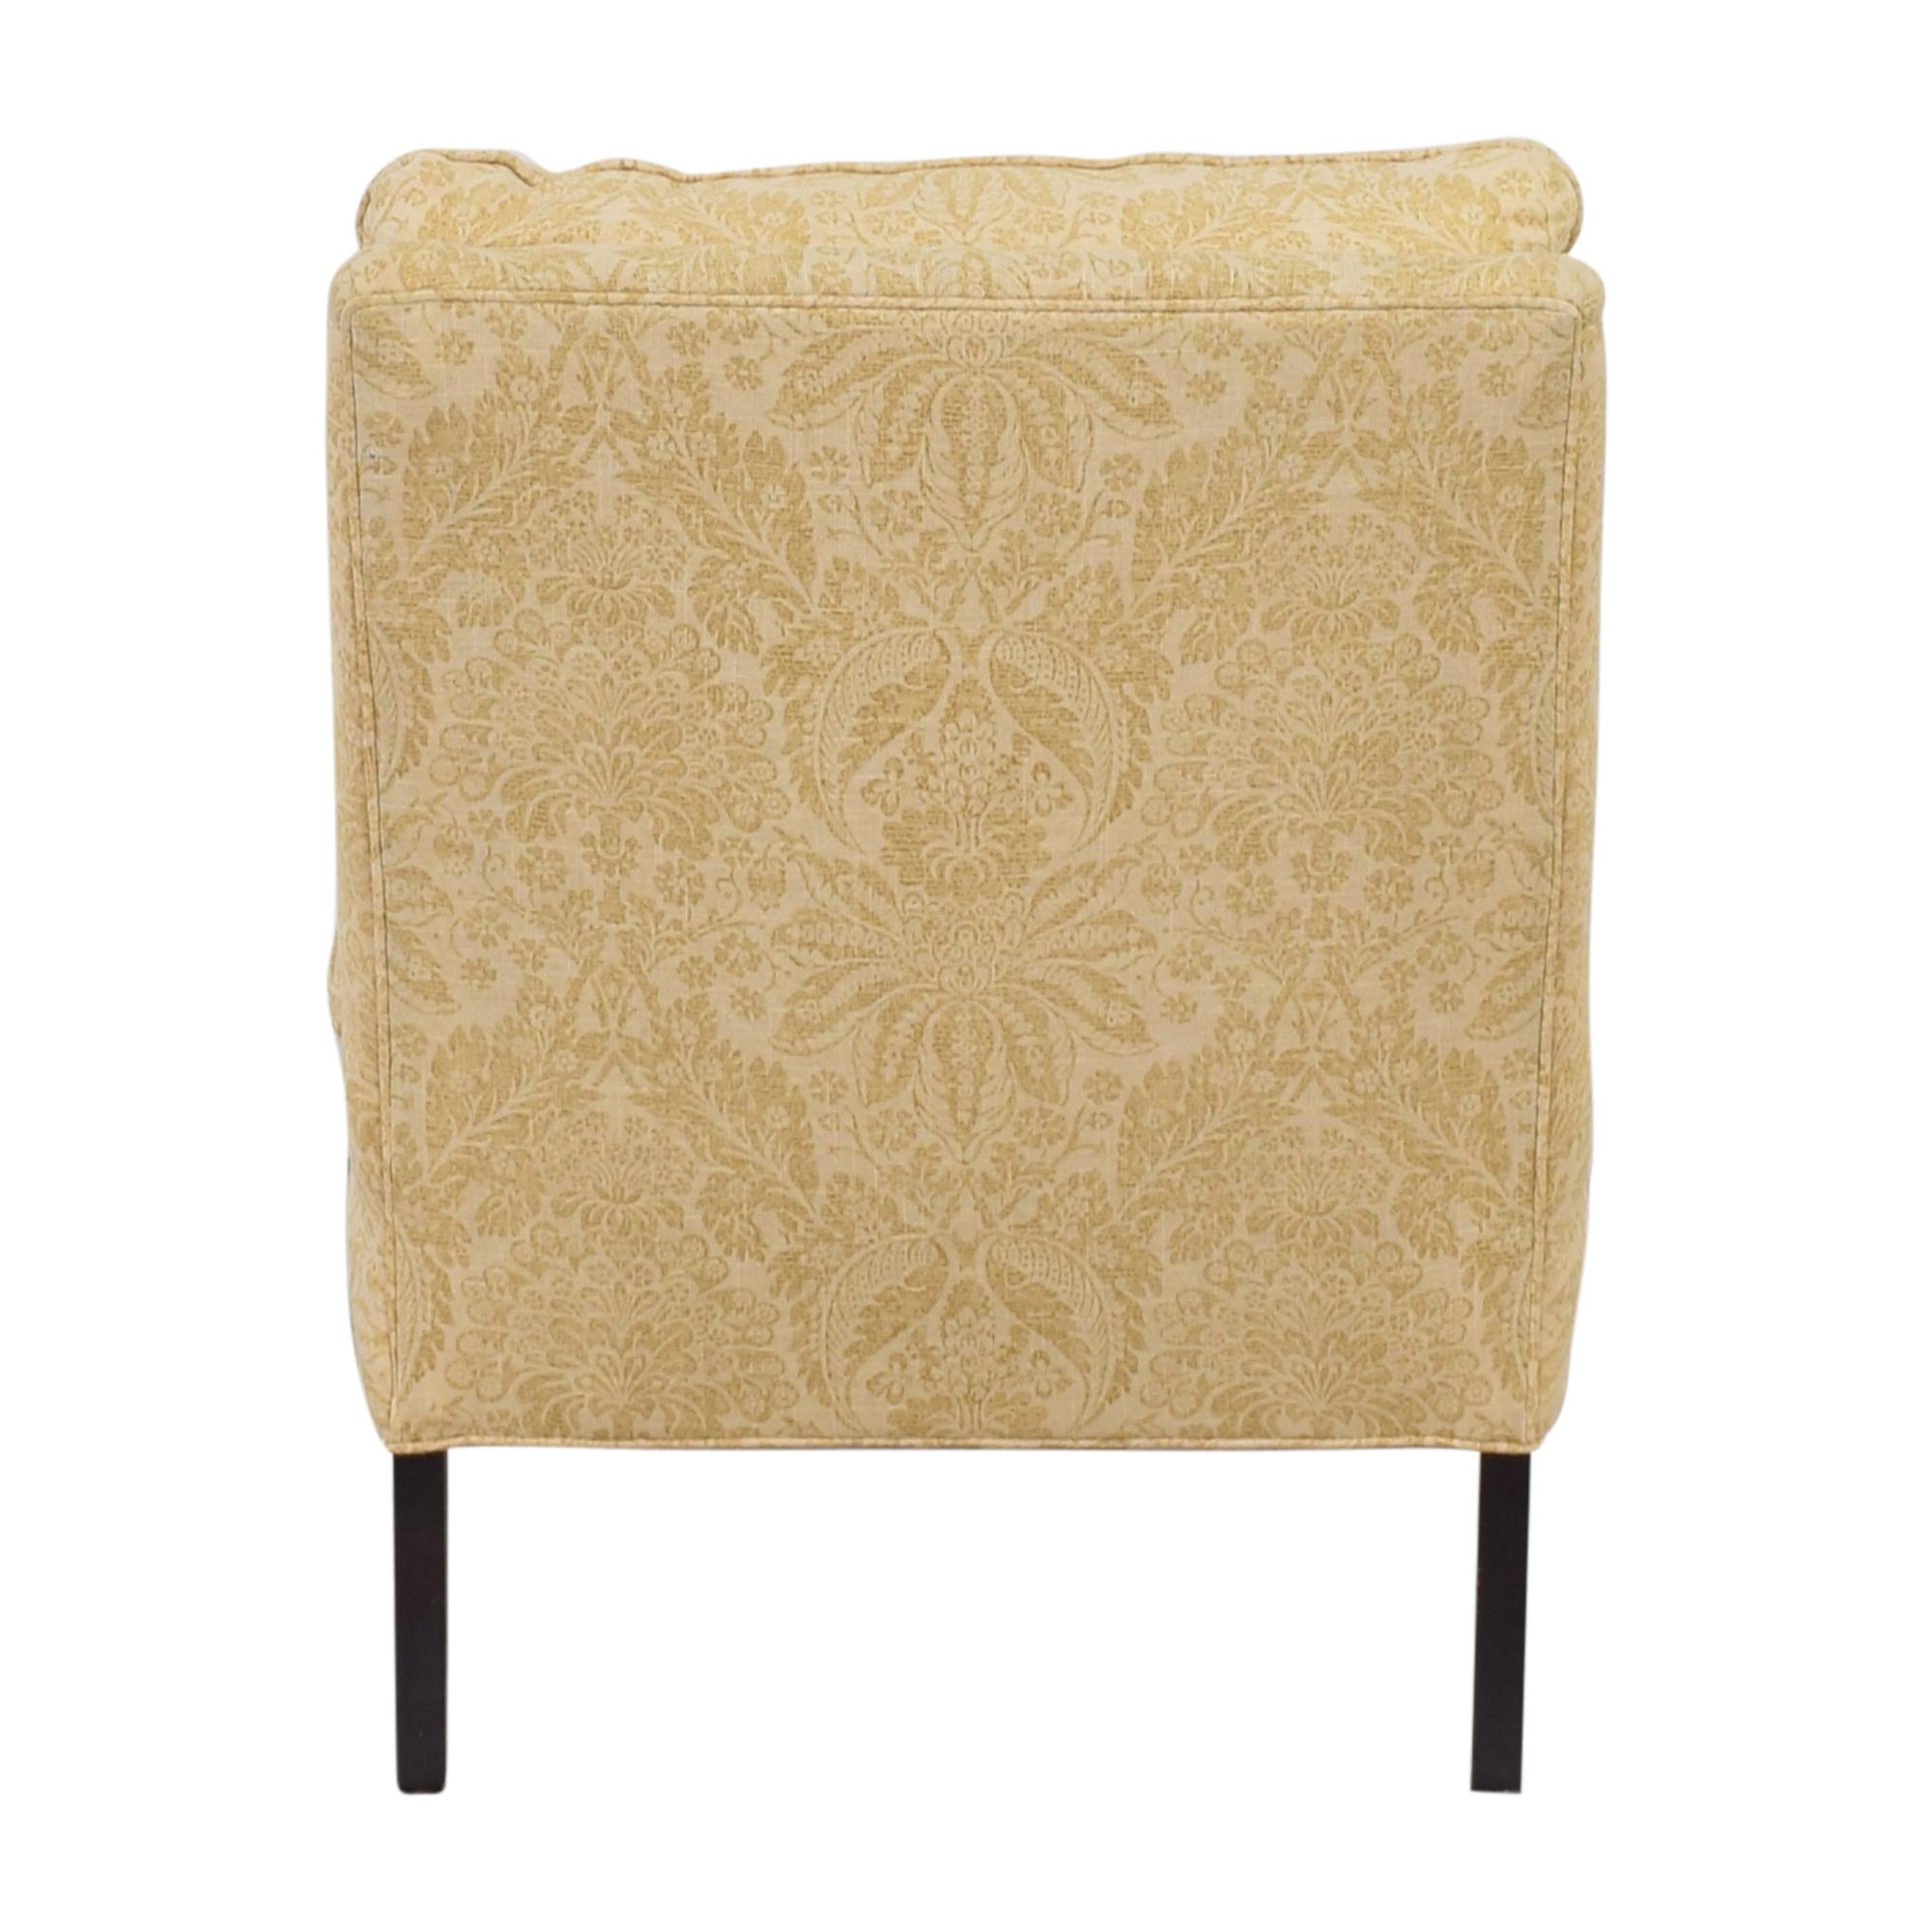 Mitchell Gold + Bob Williams Mitchell Gold + Bob Williams Lounge Chair dimensions